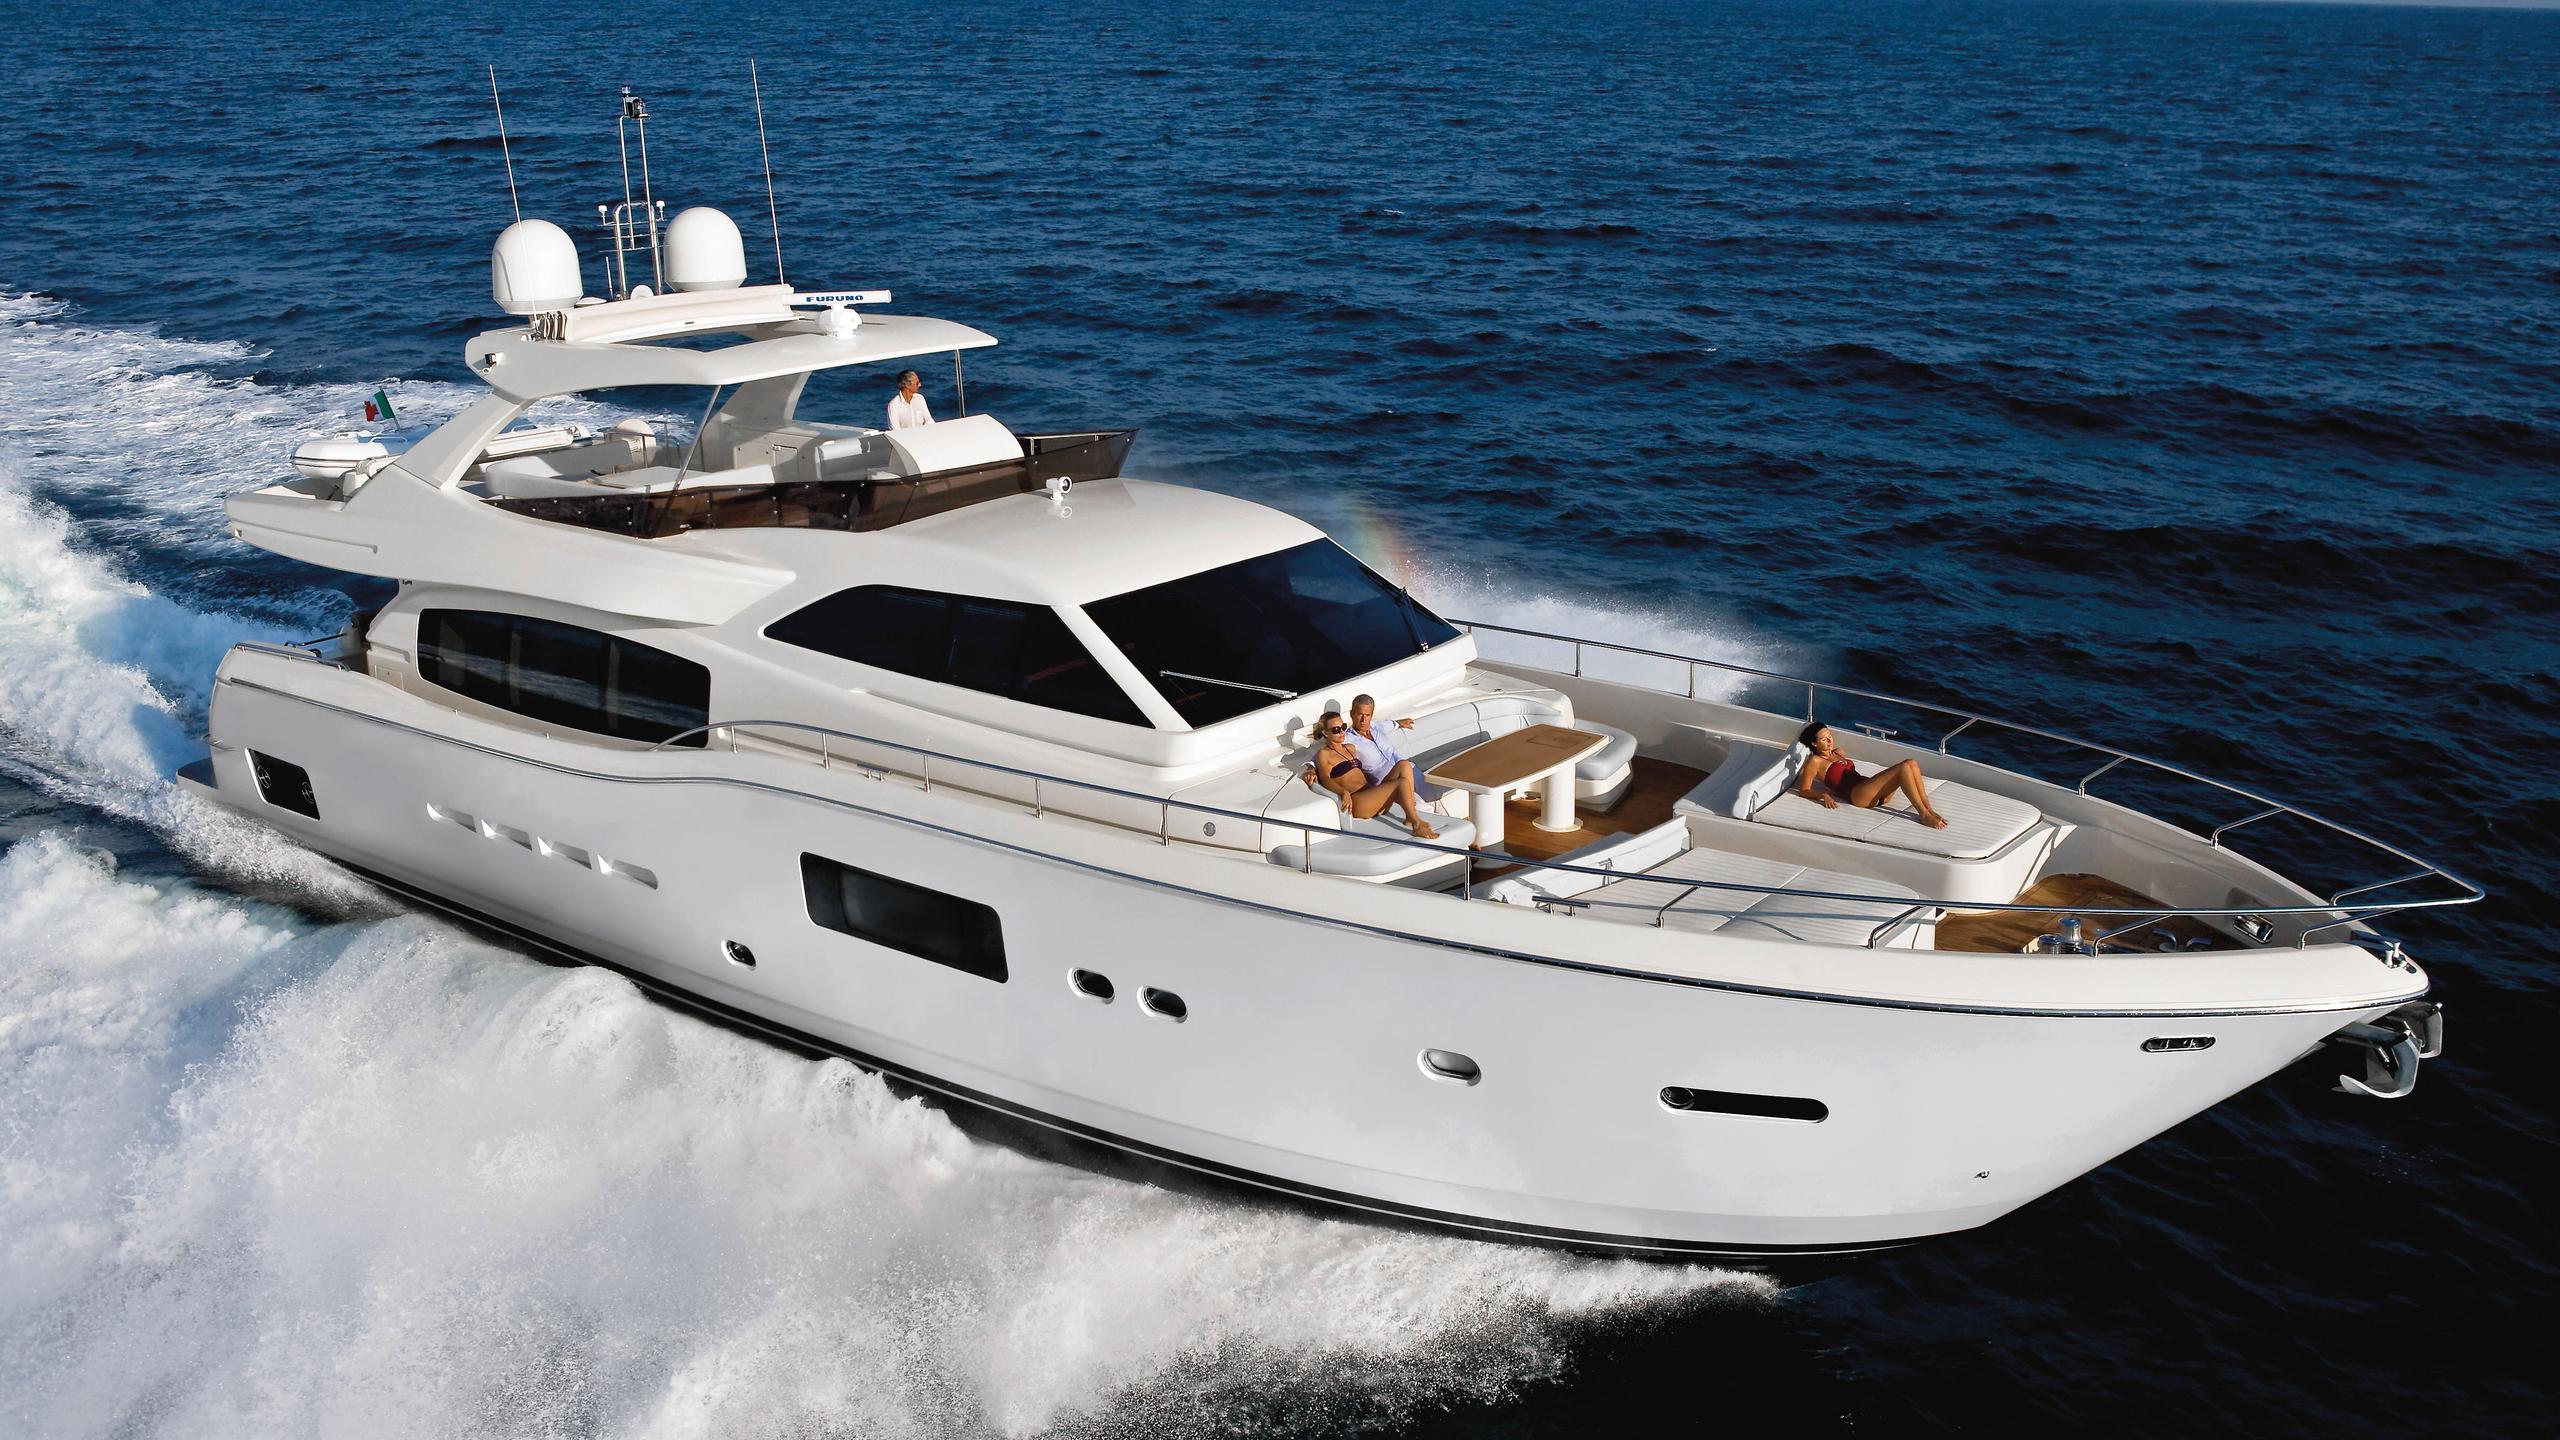 ferretti-altura-840-04-motor-yacht-ferretti-altura-840-2011-26m-cruising